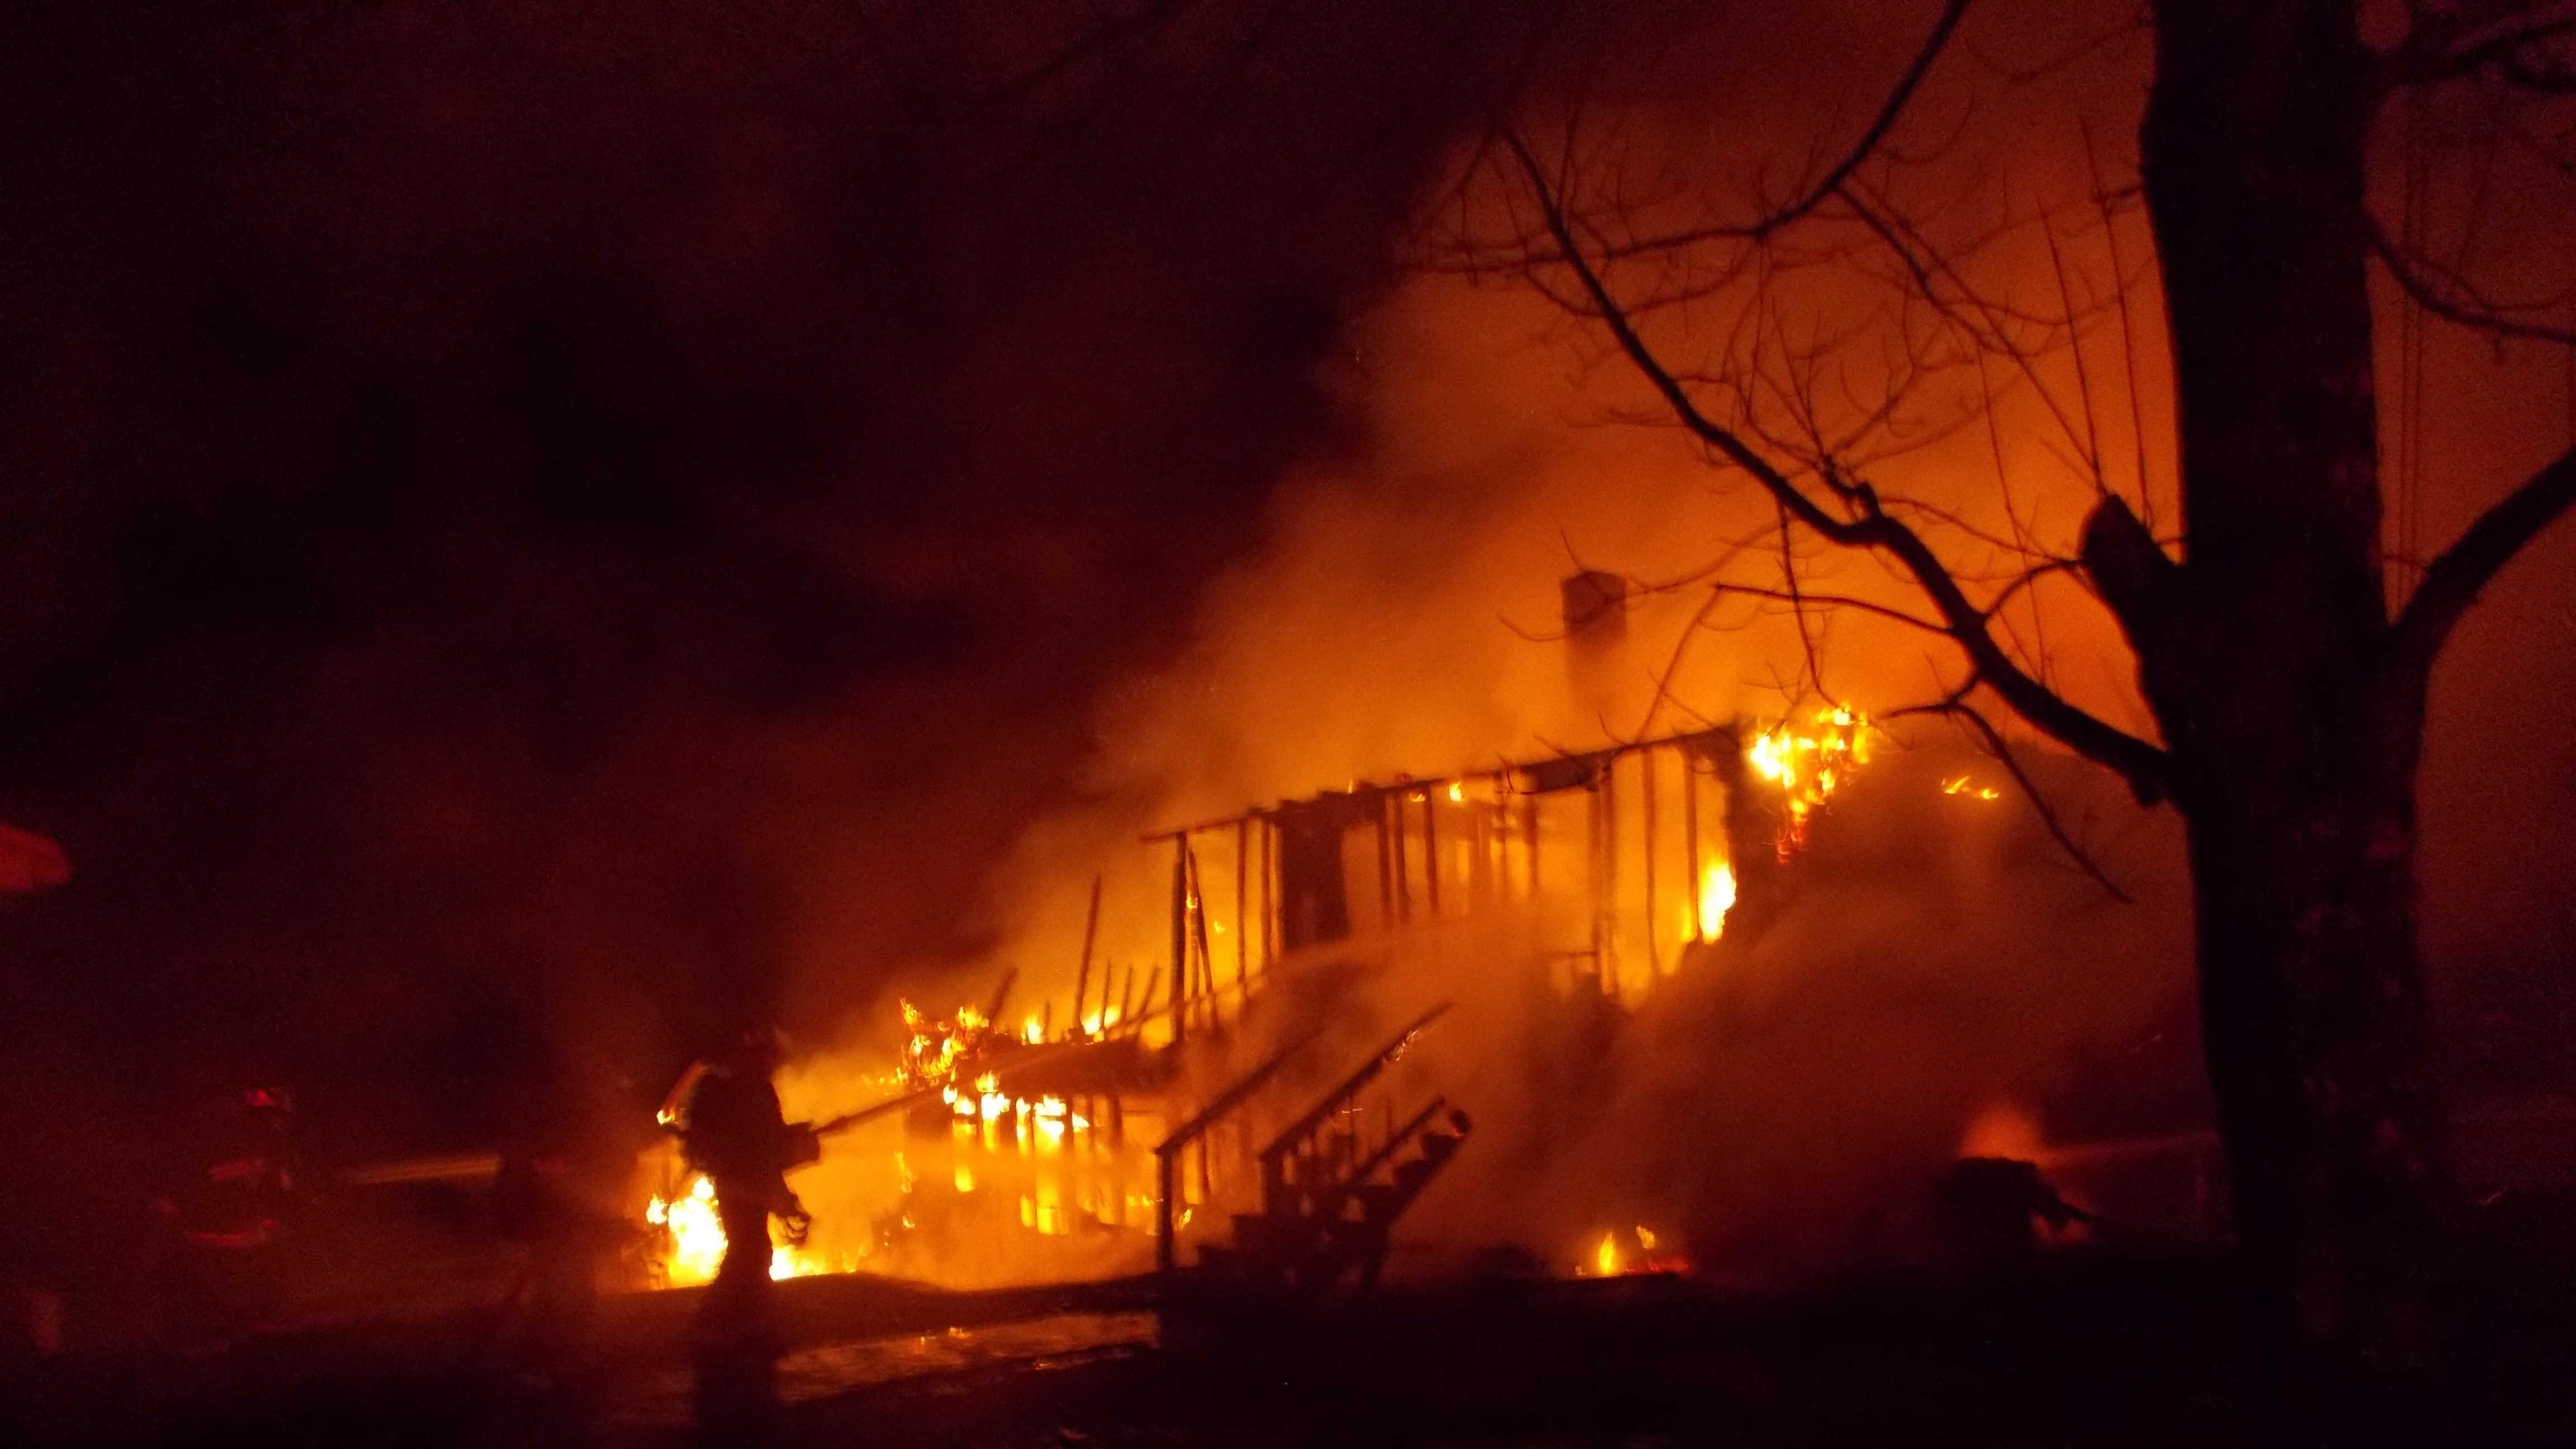 Belmont fire destroys single-family home